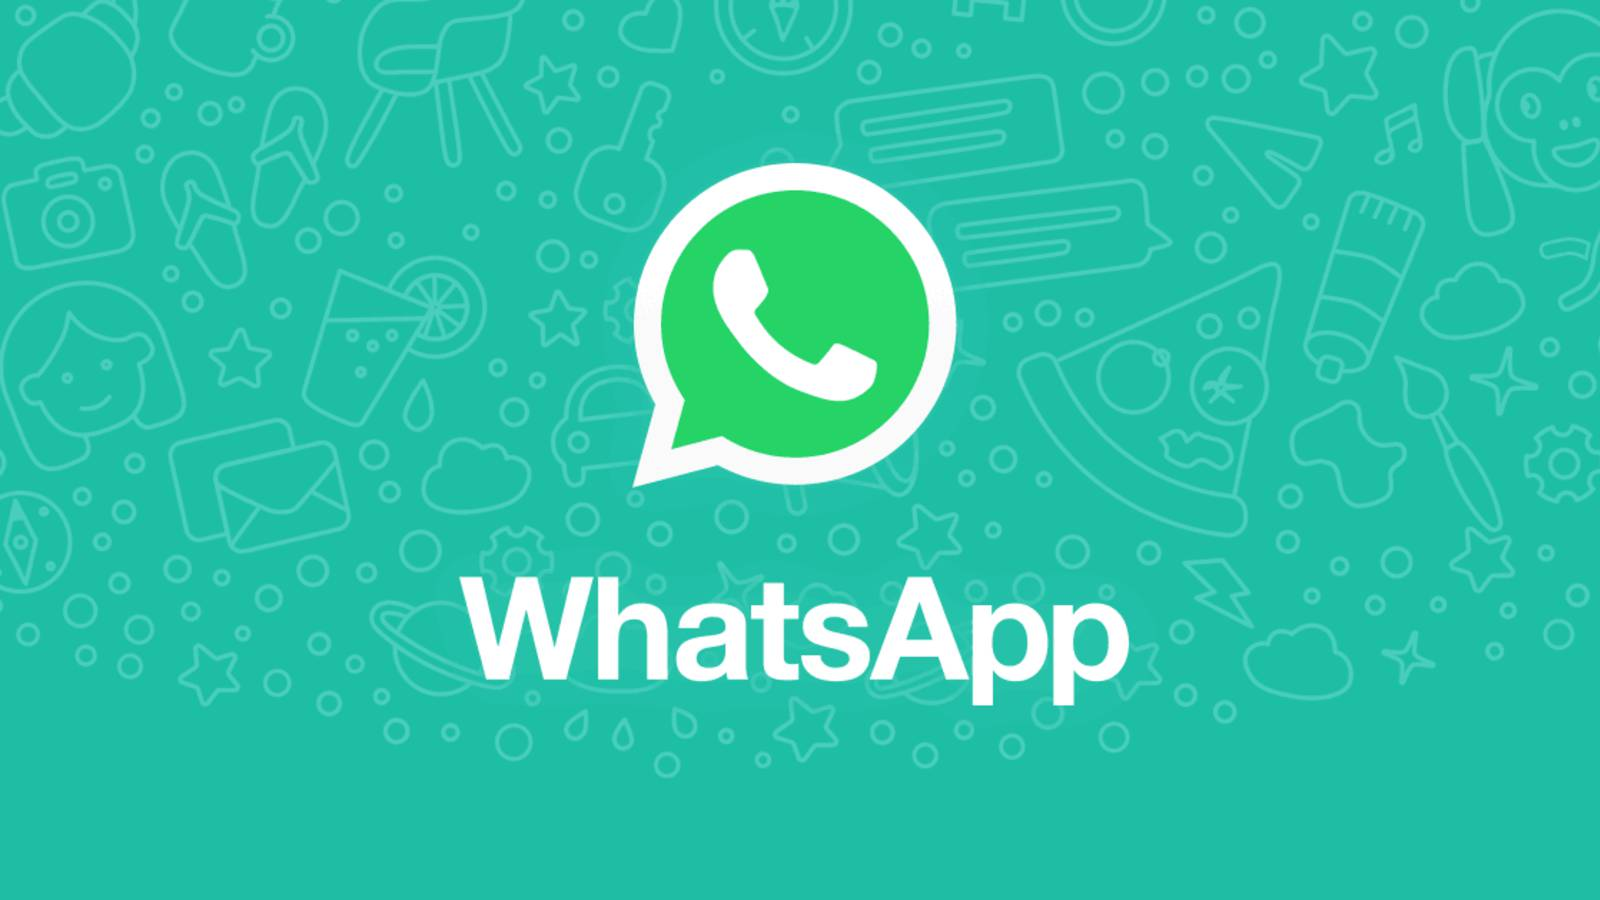 WhatsApp negasit